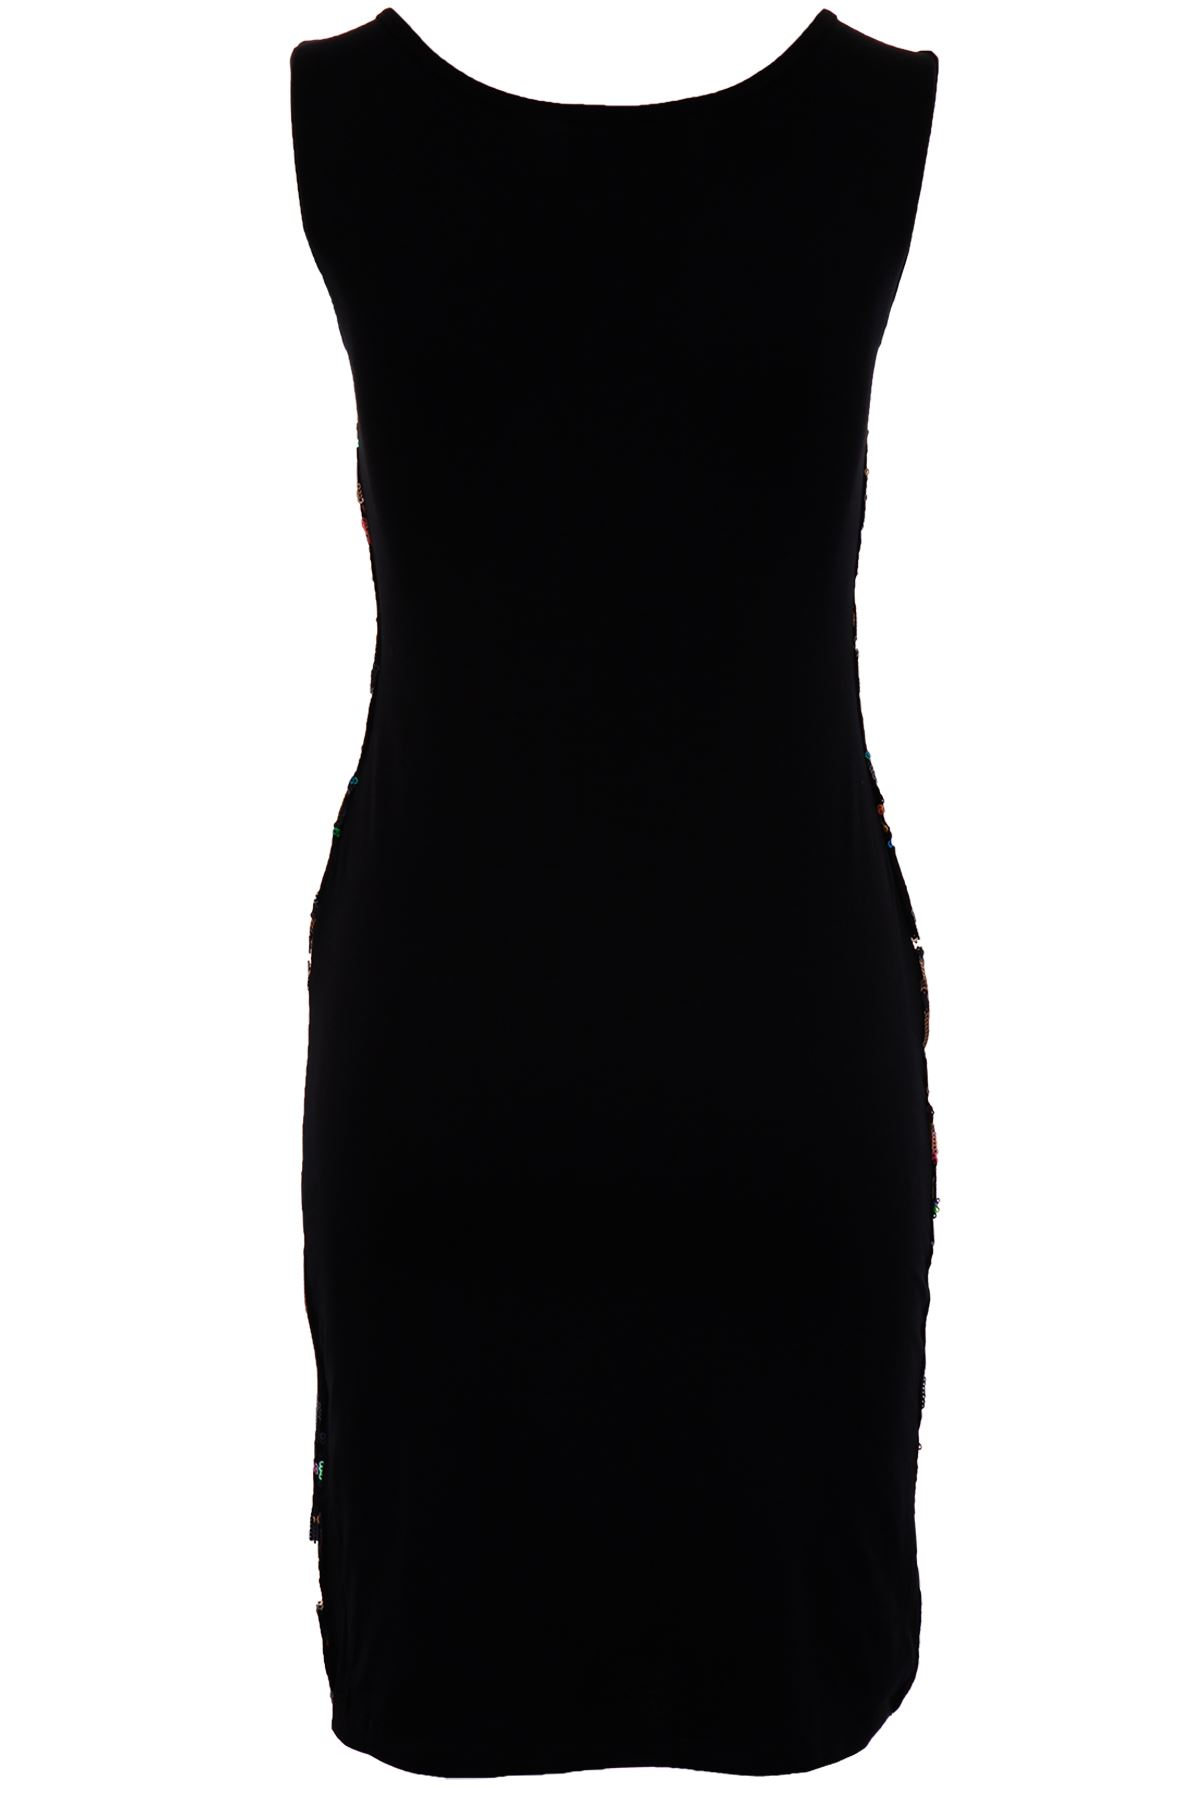 Ladies Sleeveless Multi Aztec Sequin Shiny Slim Fit Party Women/'s Bodycon Dress